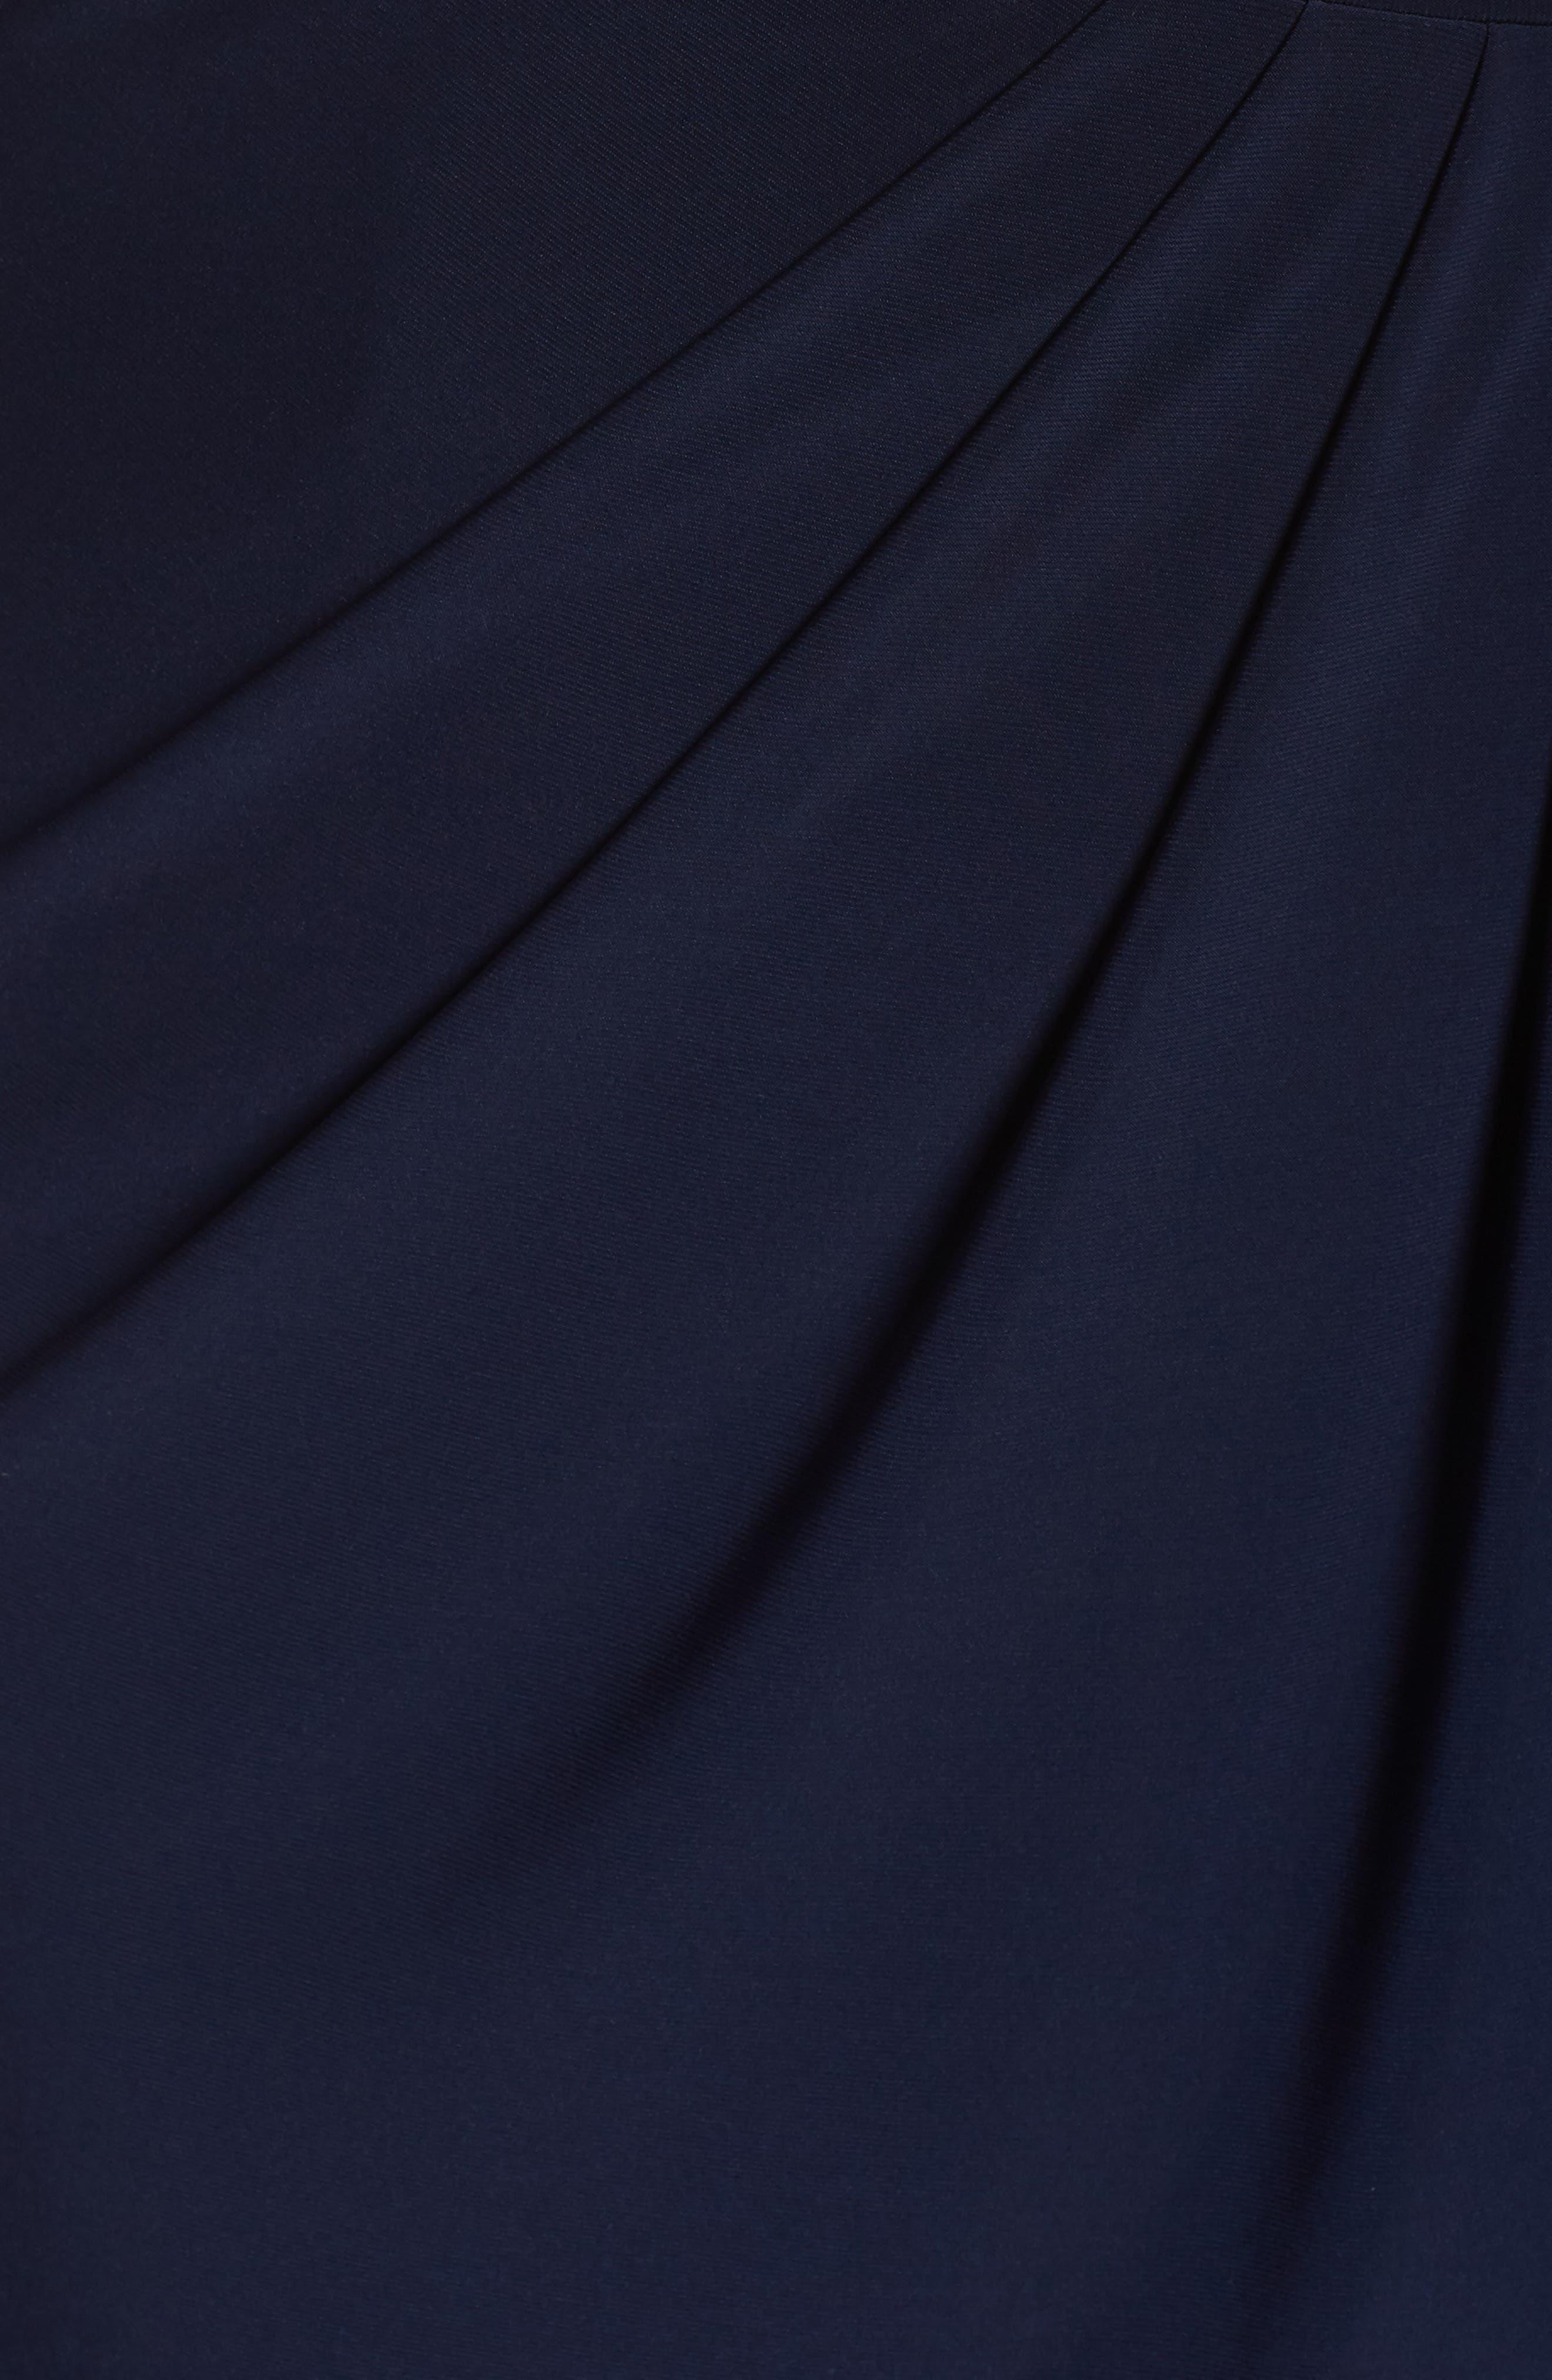 Beaded Faux Wrap Gown,                             Alternate thumbnail 5, color,                             Navy/ Gunmetal